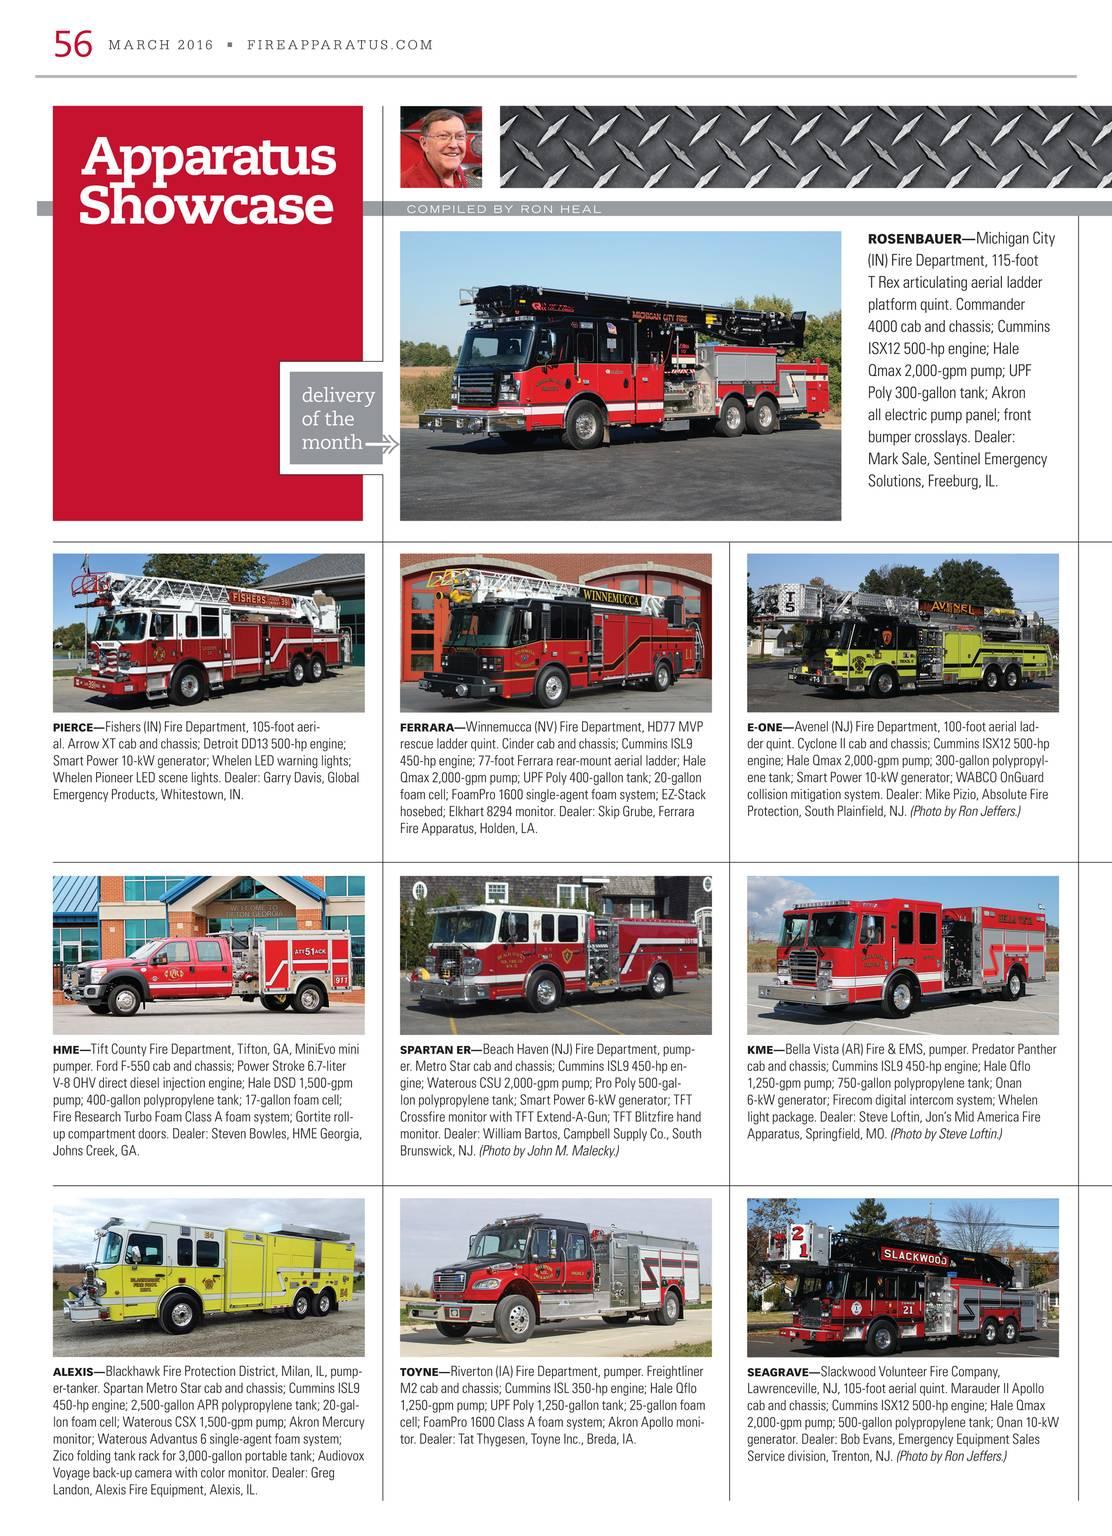 Fire Com 3000a Apparatus Intercom System Durable Service Facility Maintenance & Safety